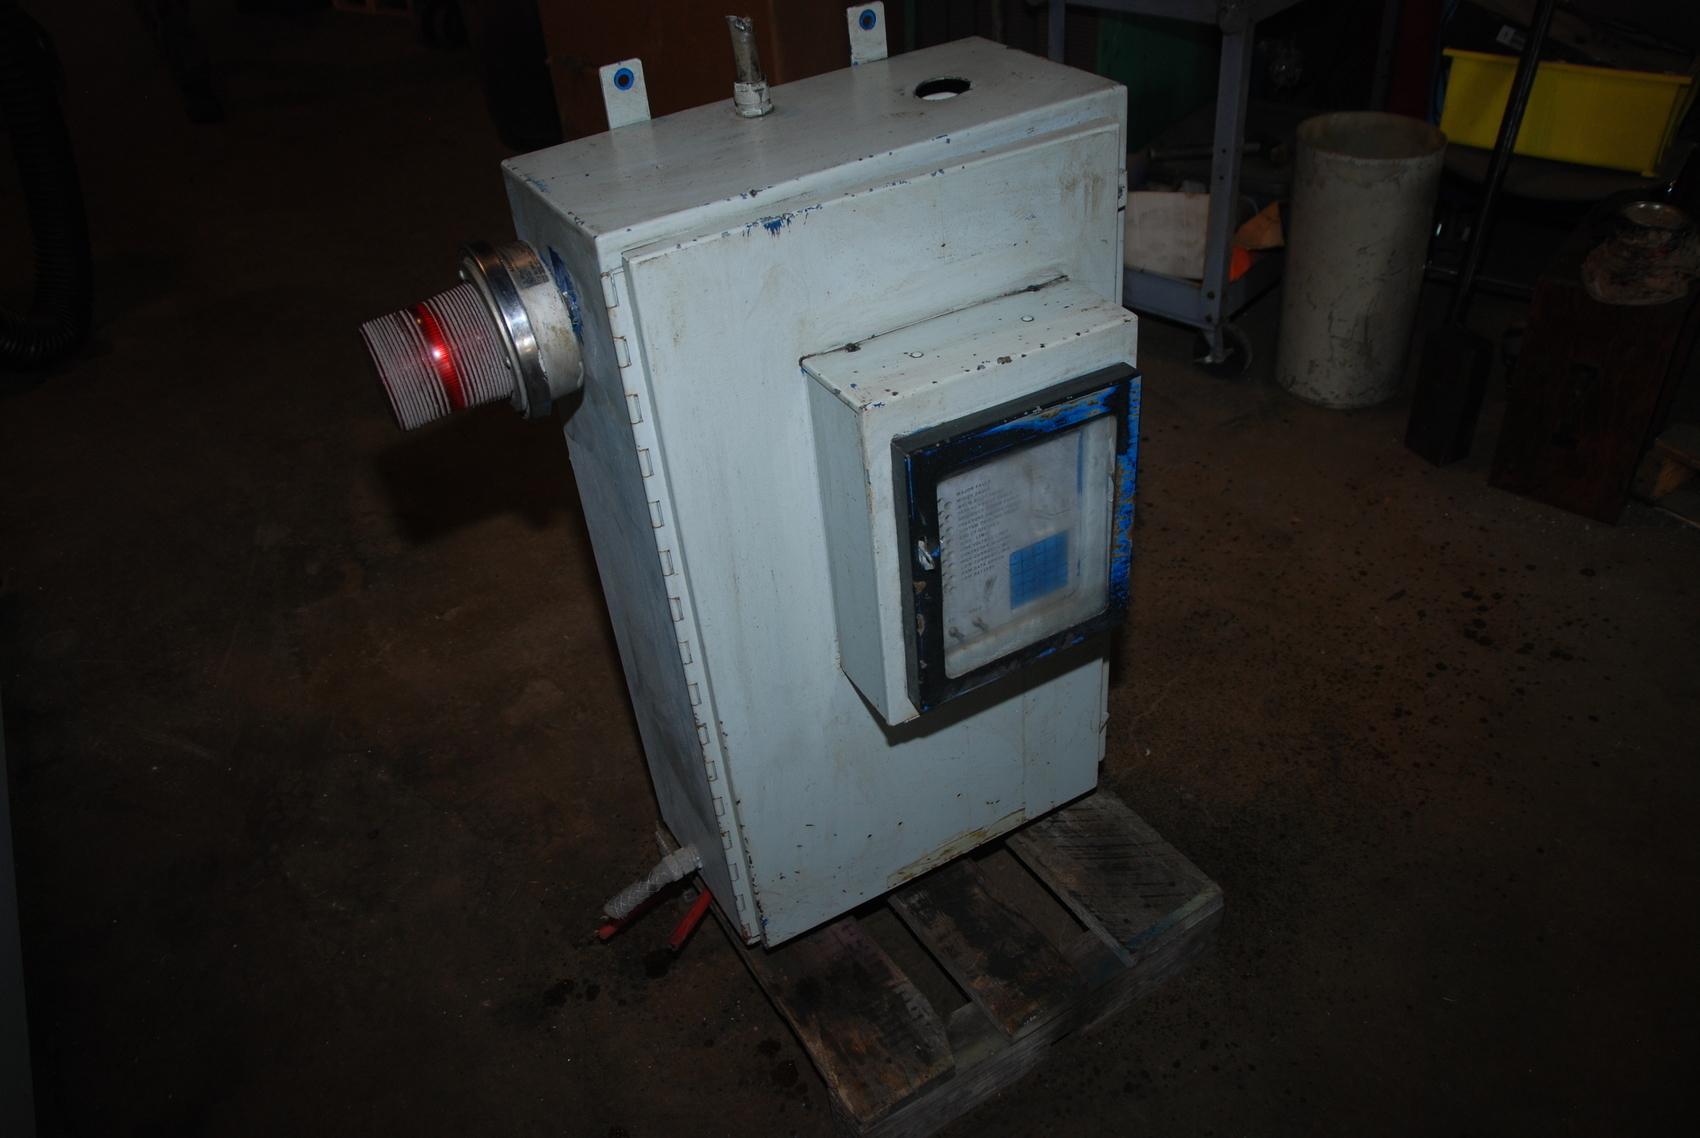 Medar INC 971-0004 Timer Assembly Weld control Panel Display Operator